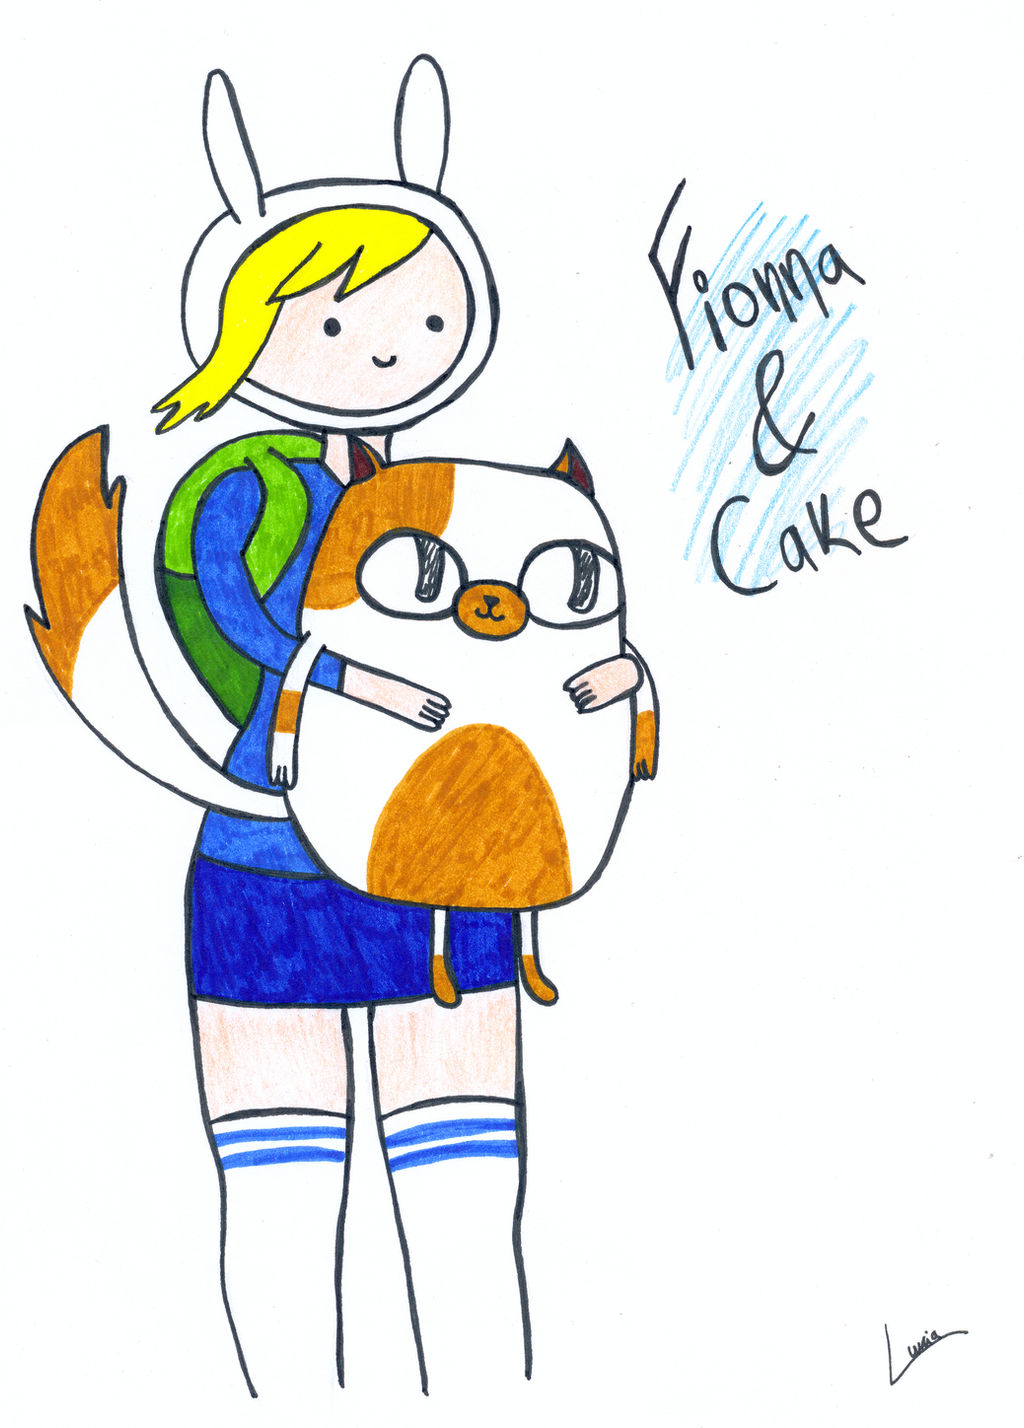 Fionna and Cake by luartandcomics